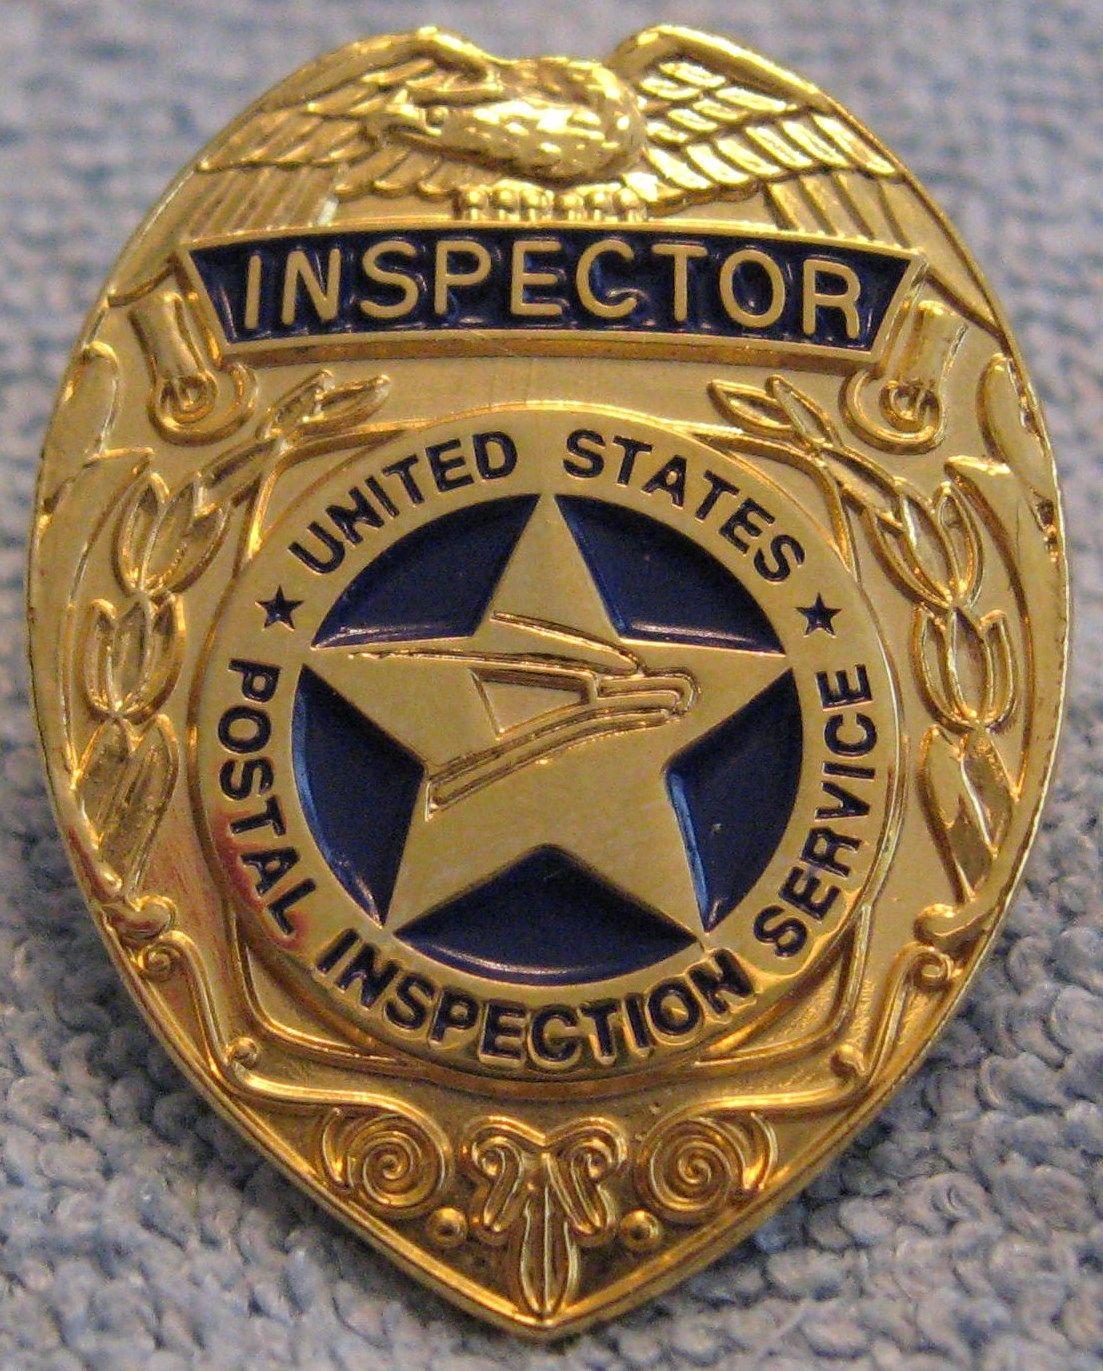 Postal Inspector Postal police, Police badge, Fire badge